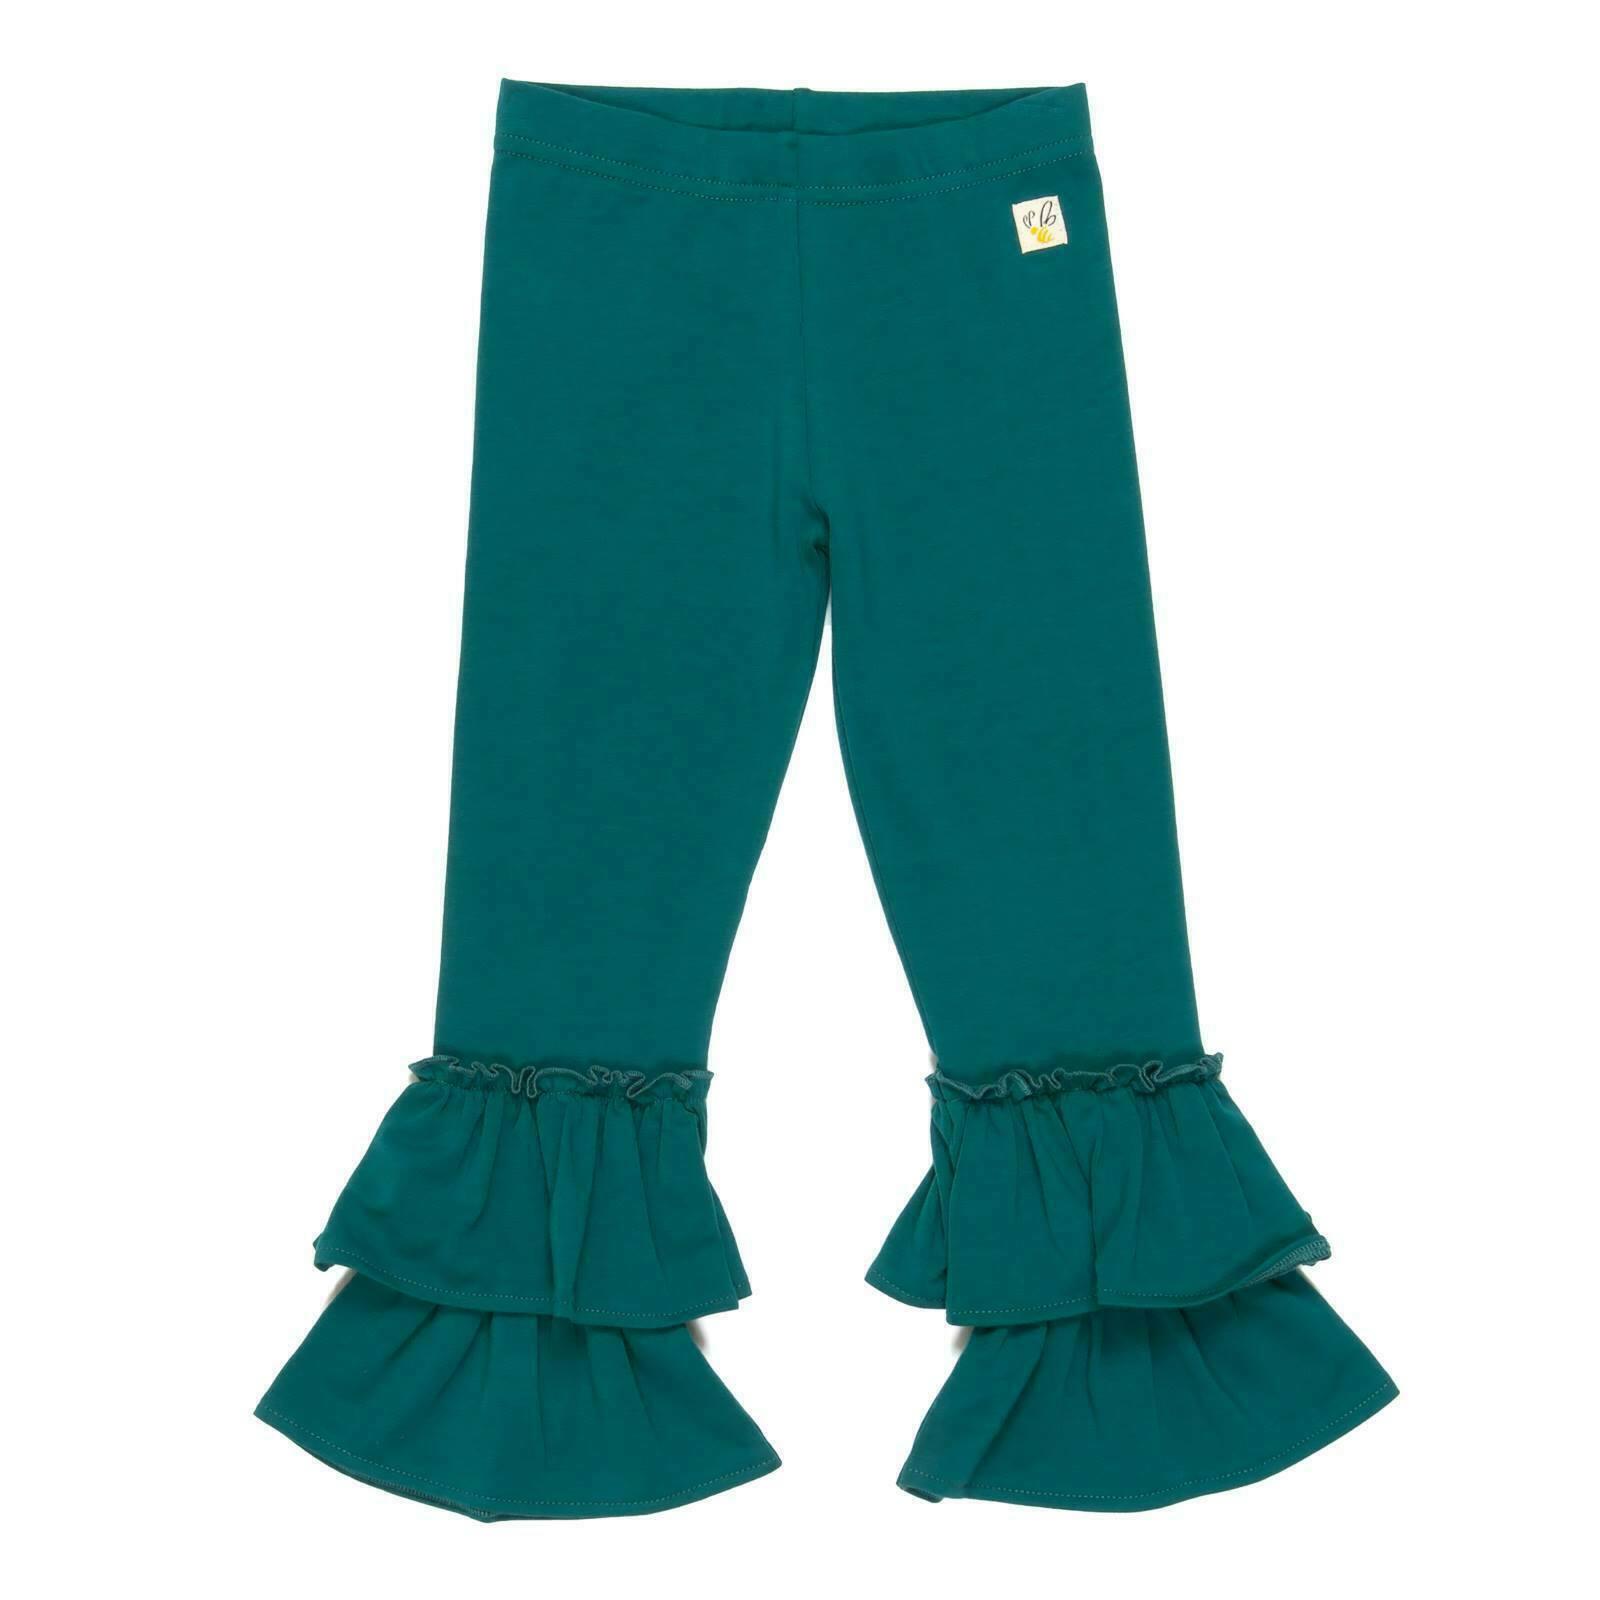 NEW wildflowers clothing girl leggings size 2/4/6/8/10/12/14